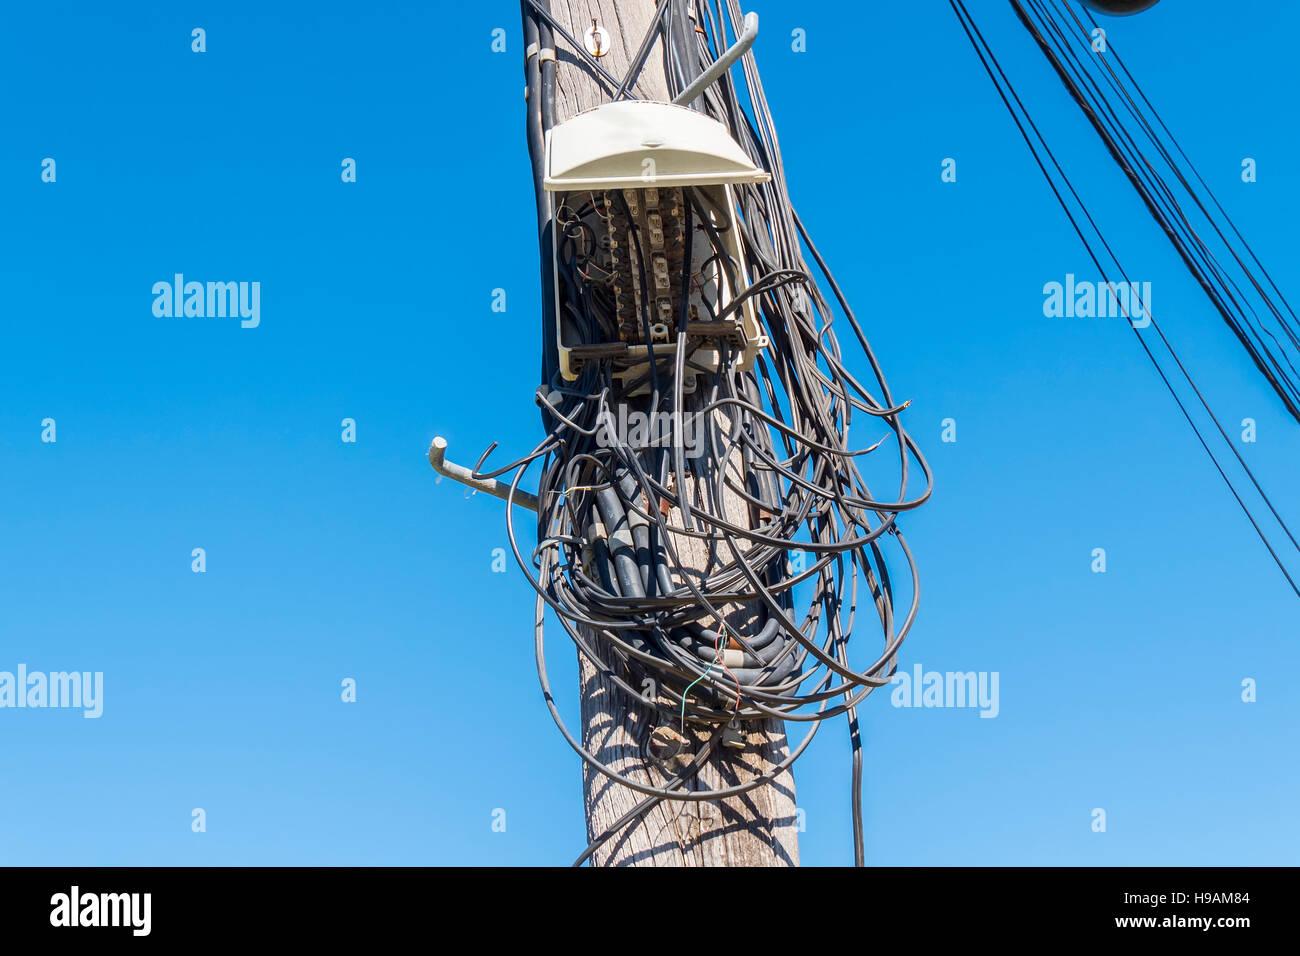 Poor Installation Stockfotos & Poor Installation Bilder - Alamy